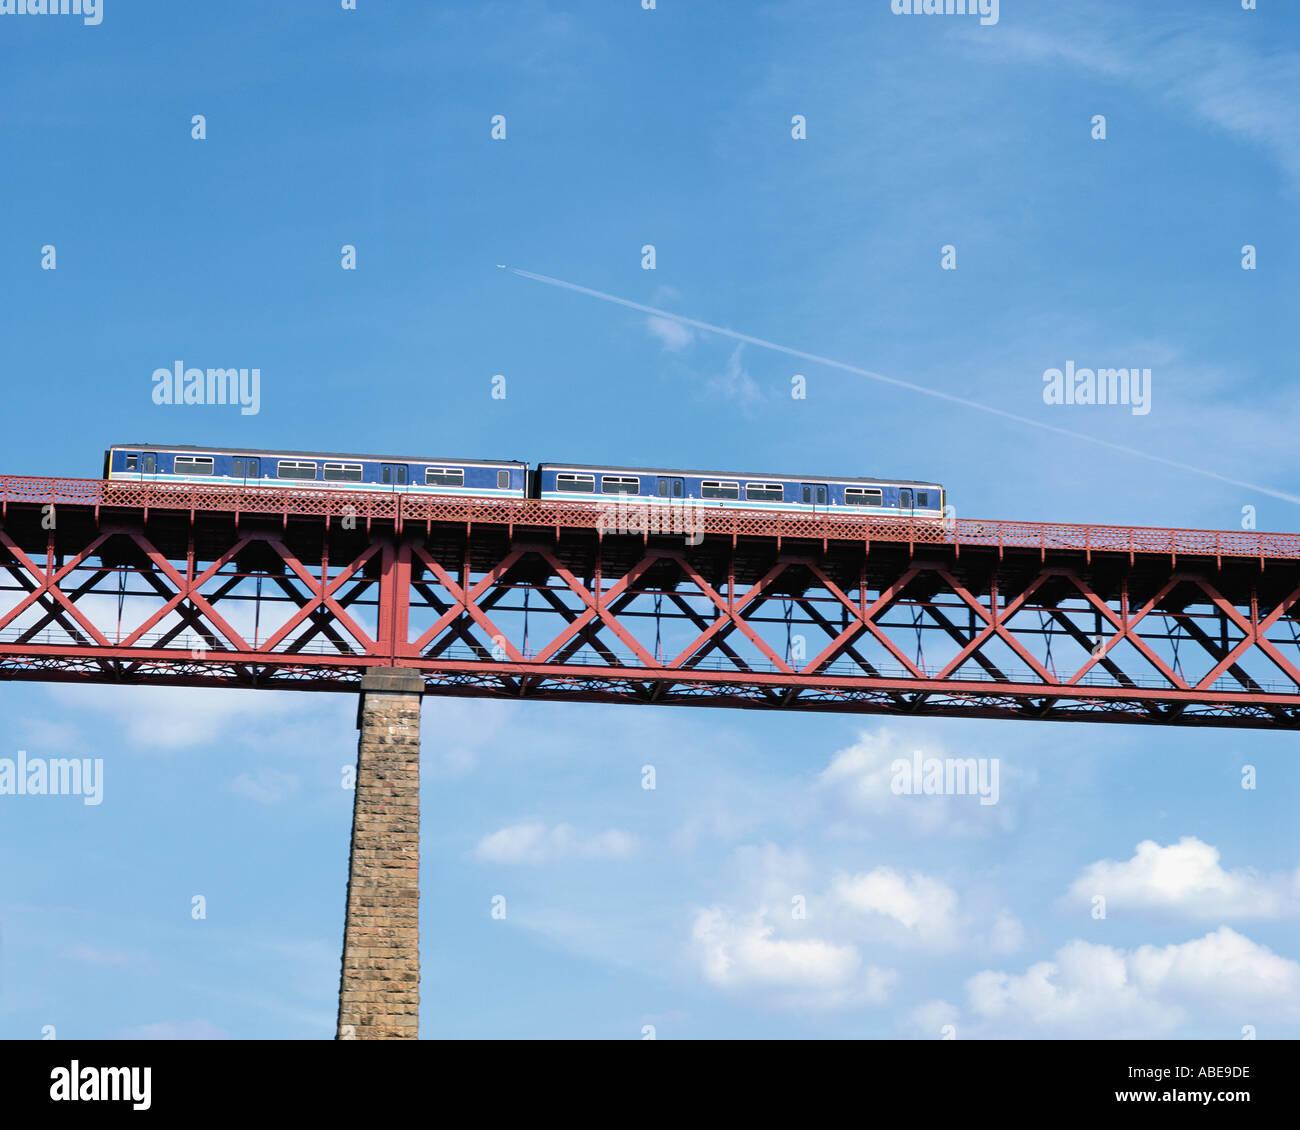 Suspended rail bridge - Stock Image